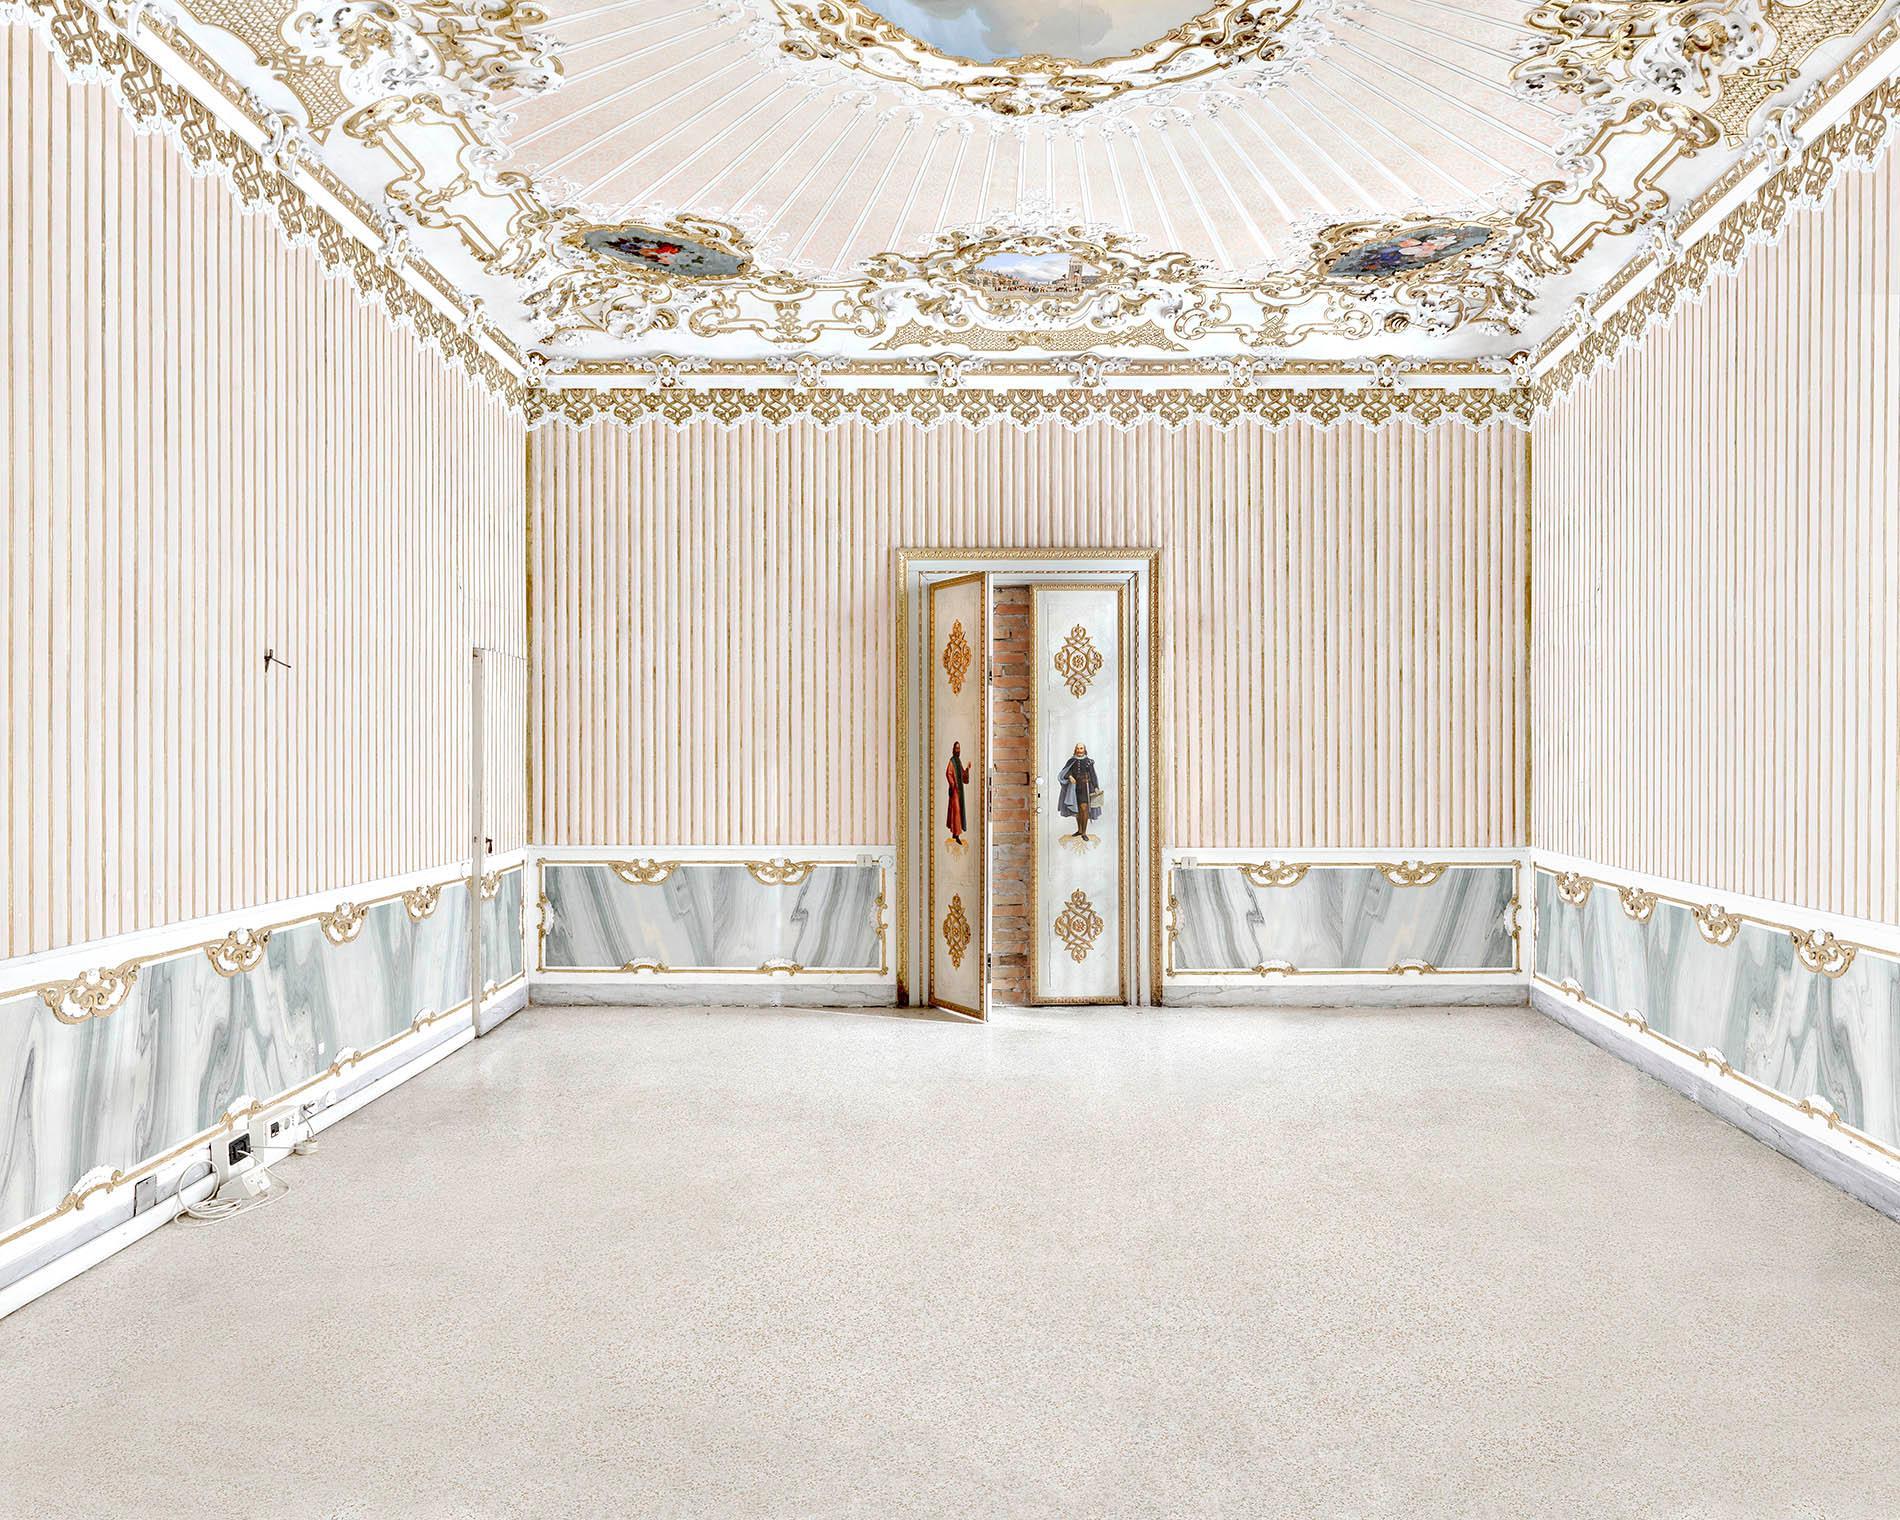 Museo Correr II, Venezia 2016